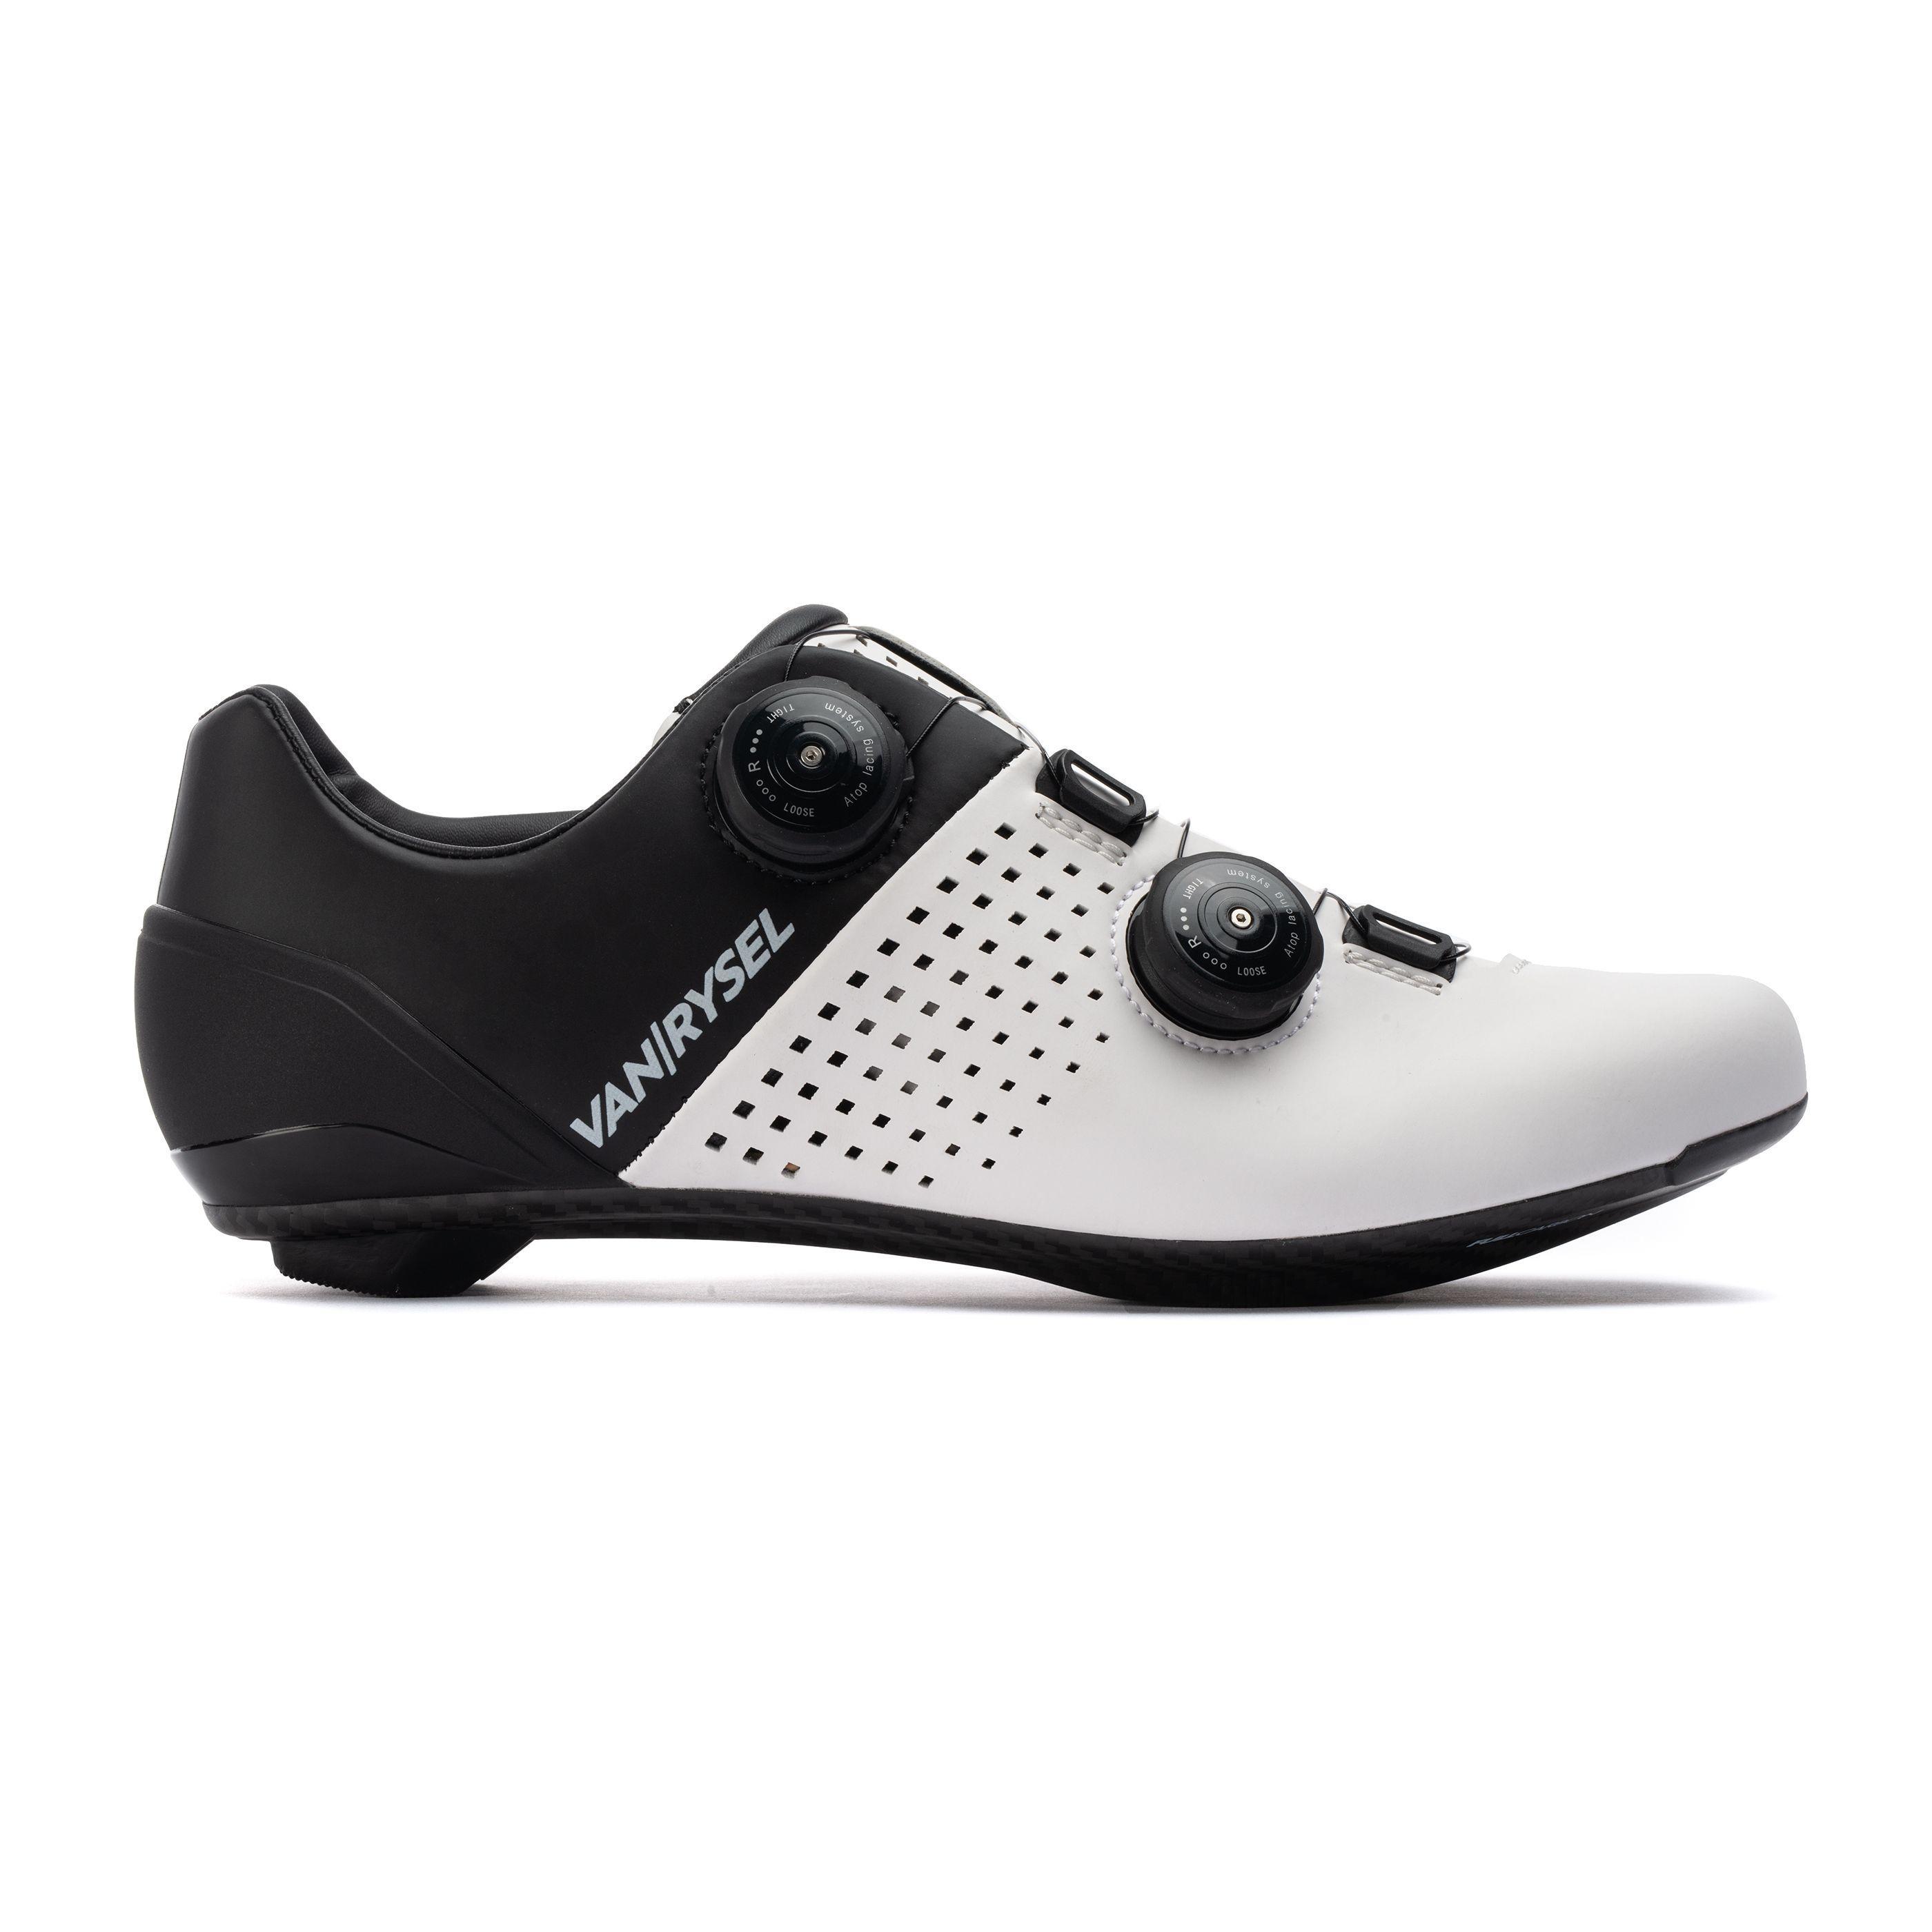 Fahrradschuhe Rennrad RR 900 weiß   Schuhe > Sportschuhe > Fahrradschuhe   Weiß   Van rysel